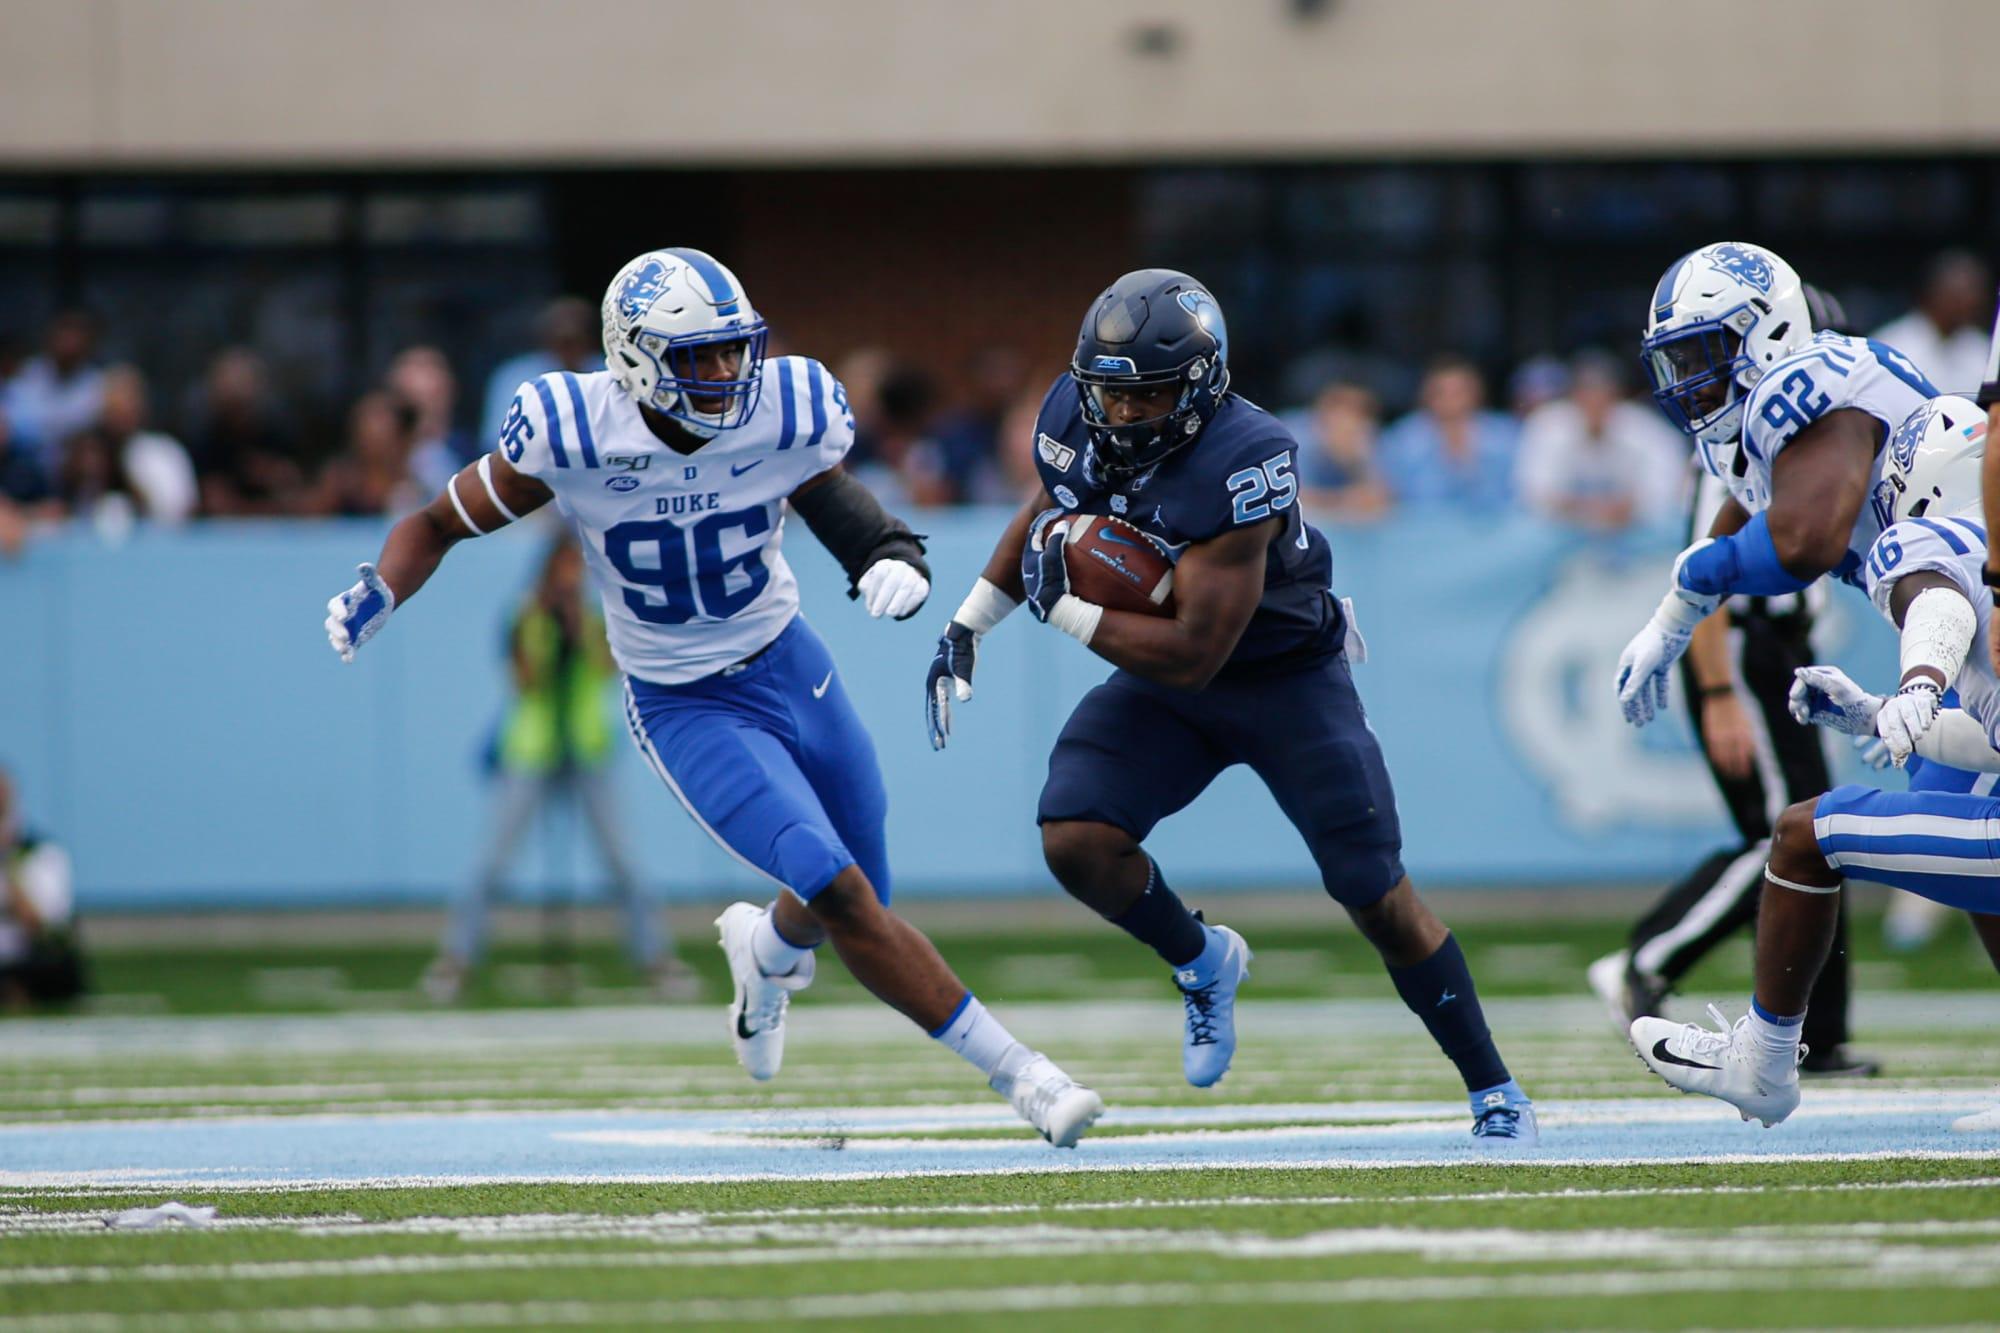 Early kickoff set as Duke football program hopes to regain Victory Bell